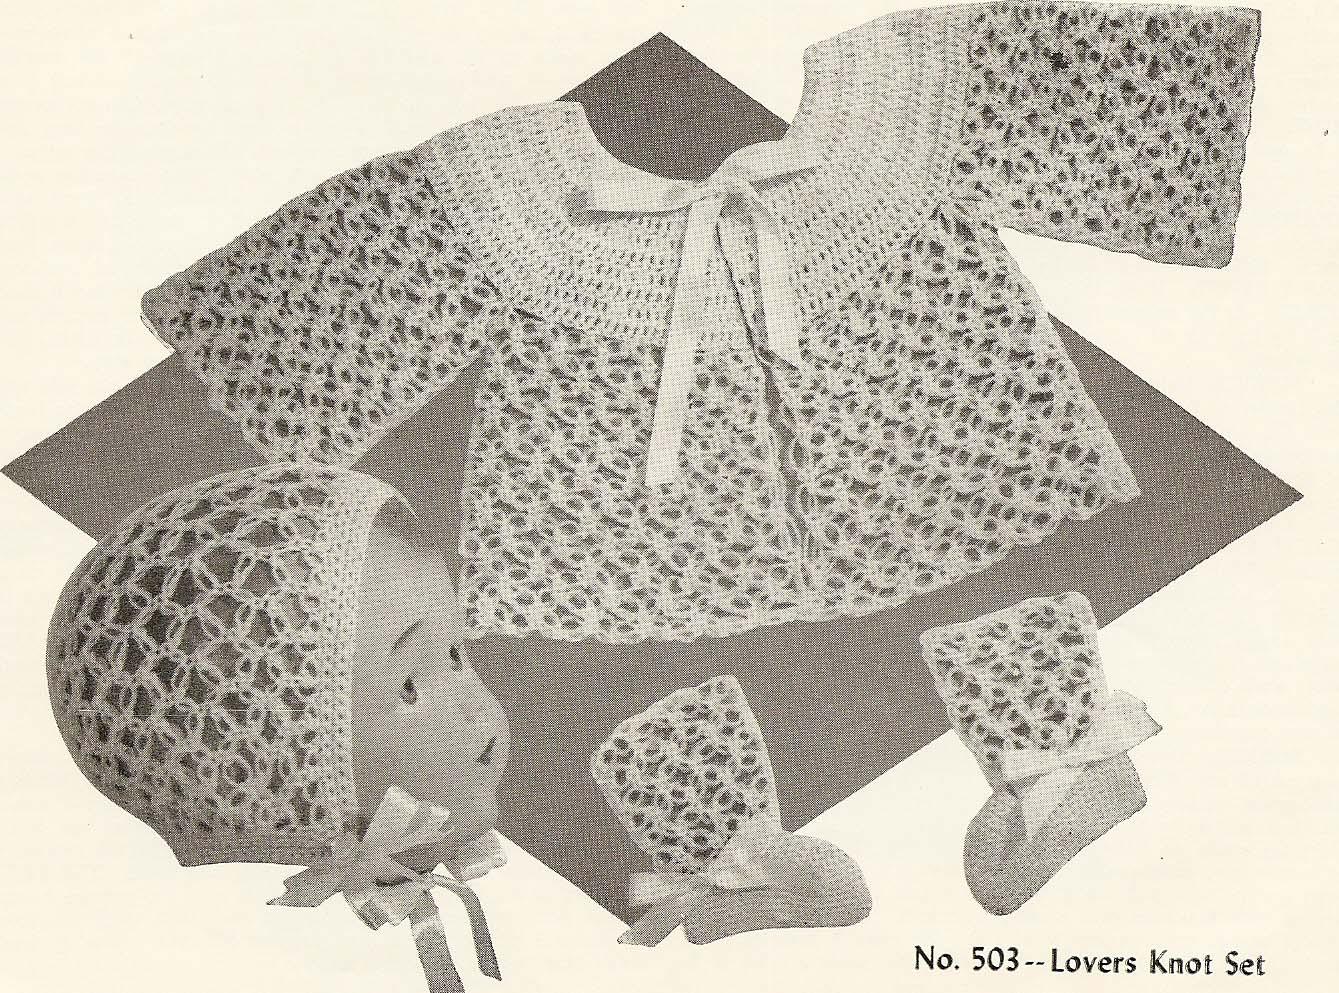 Lovers Knot Knitting Stitch : Vintage Knit Crochet Pattern Shop: Doreen For Tiny Tots Crochet Knitting Patt...